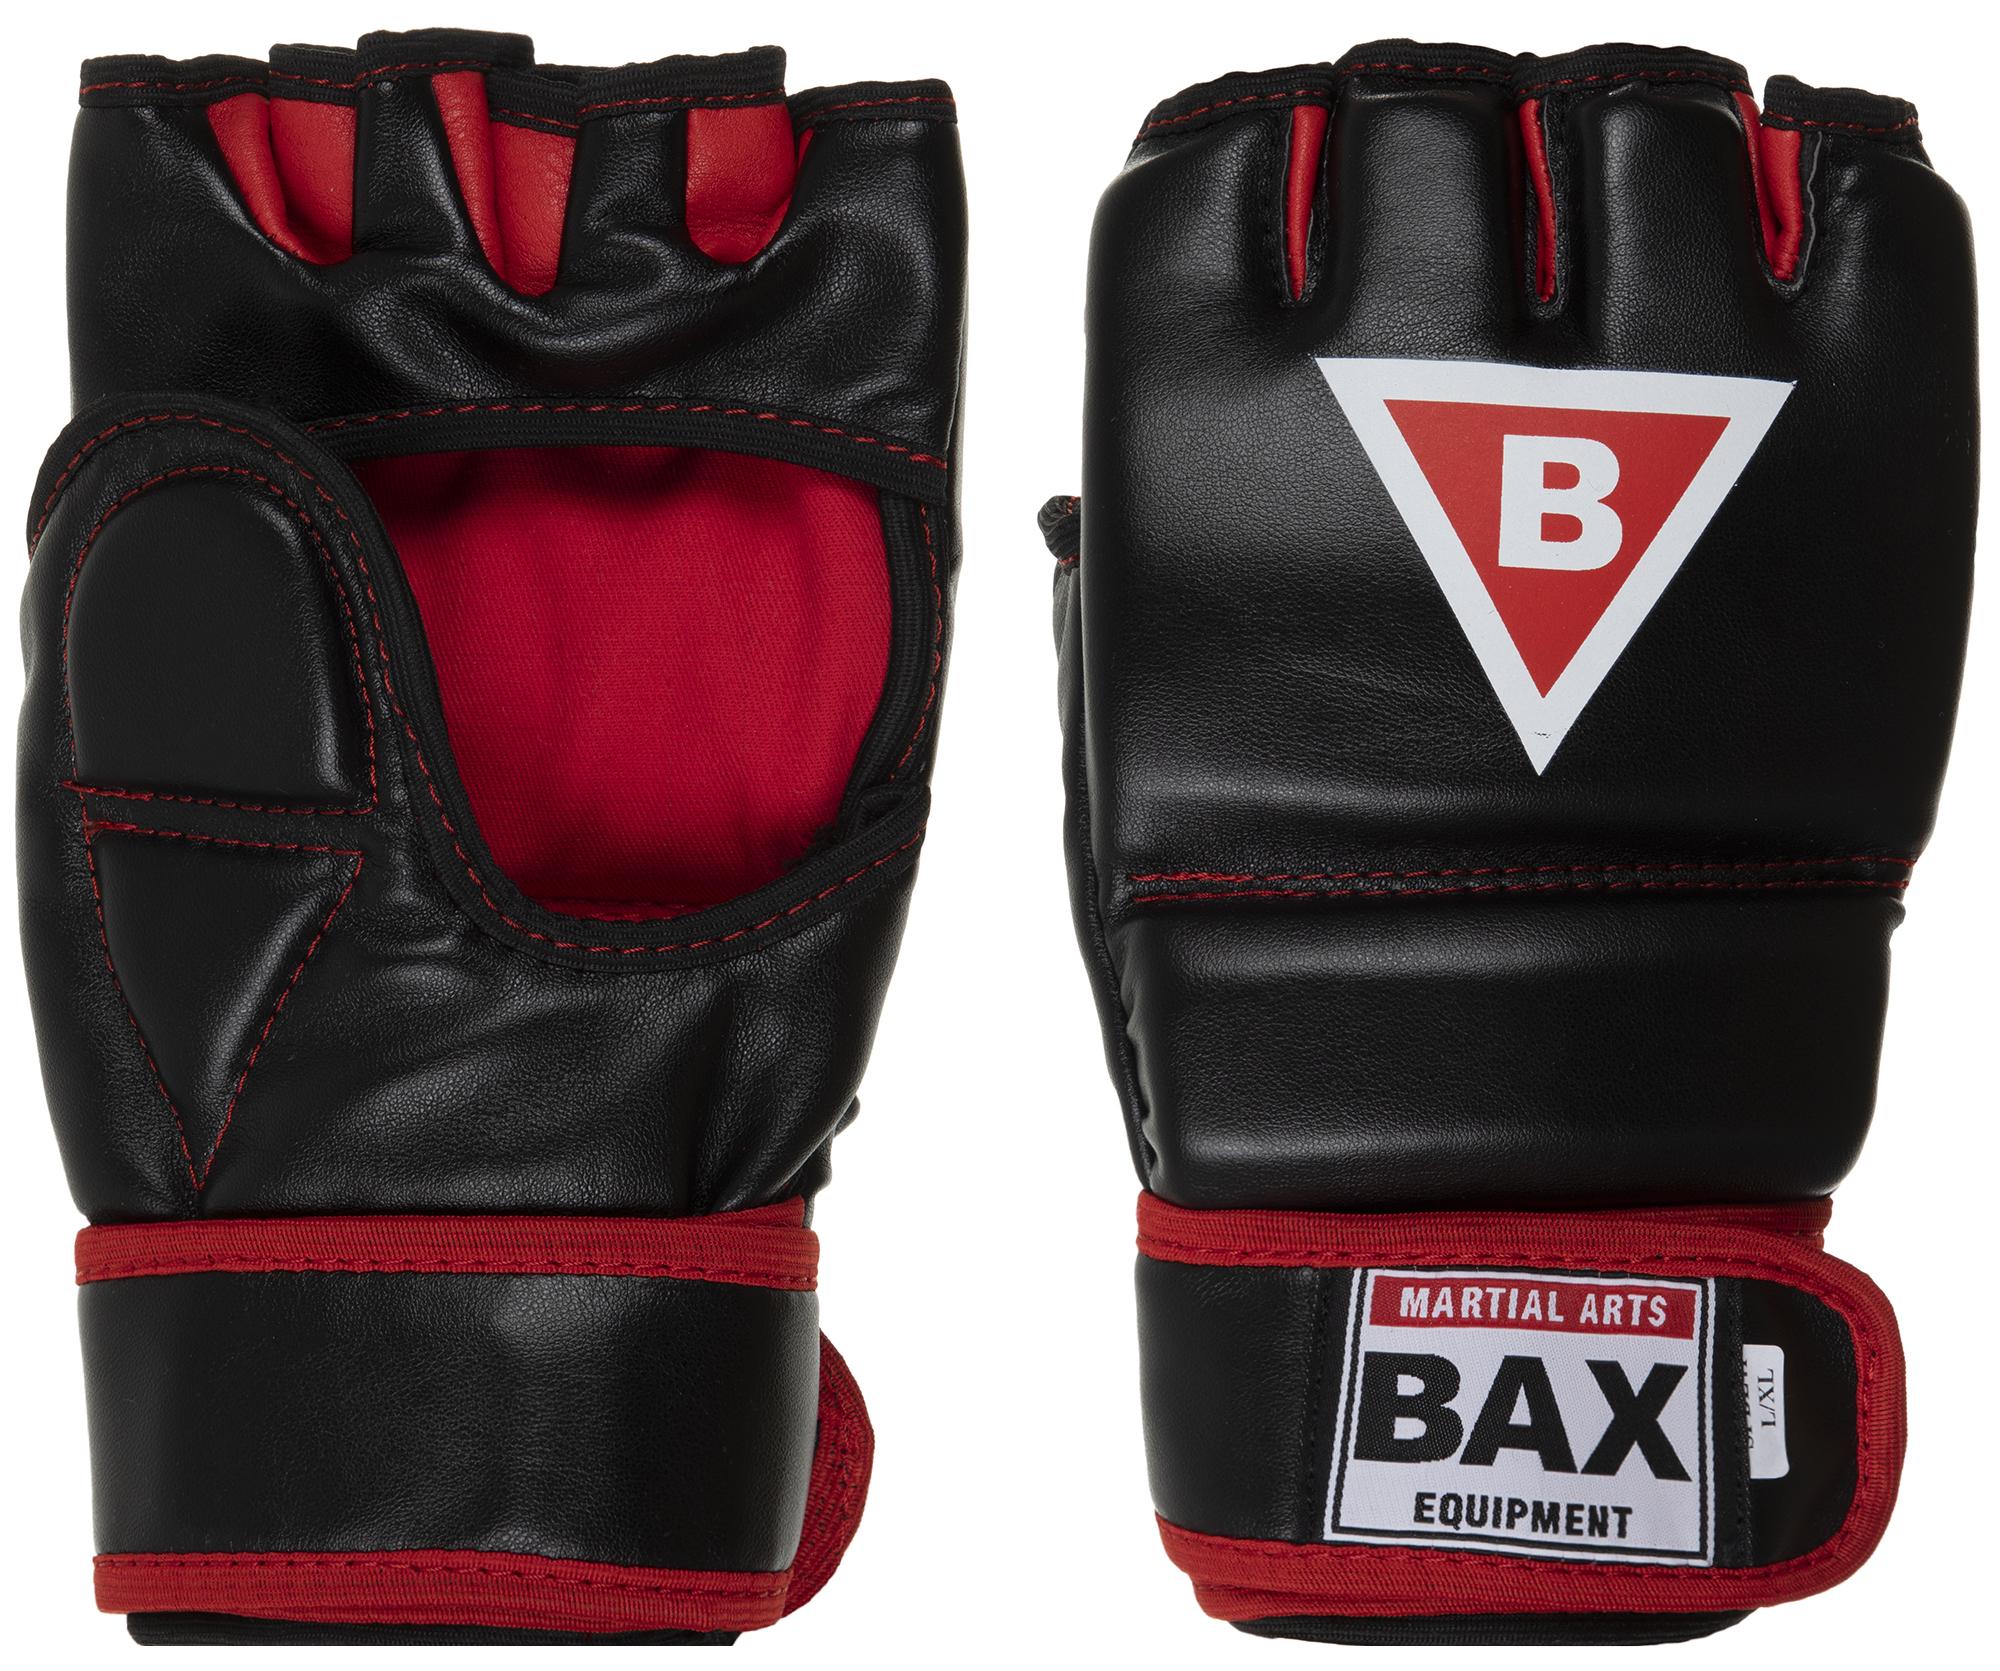 Bax Шингарты детские Bax, размер L-XL